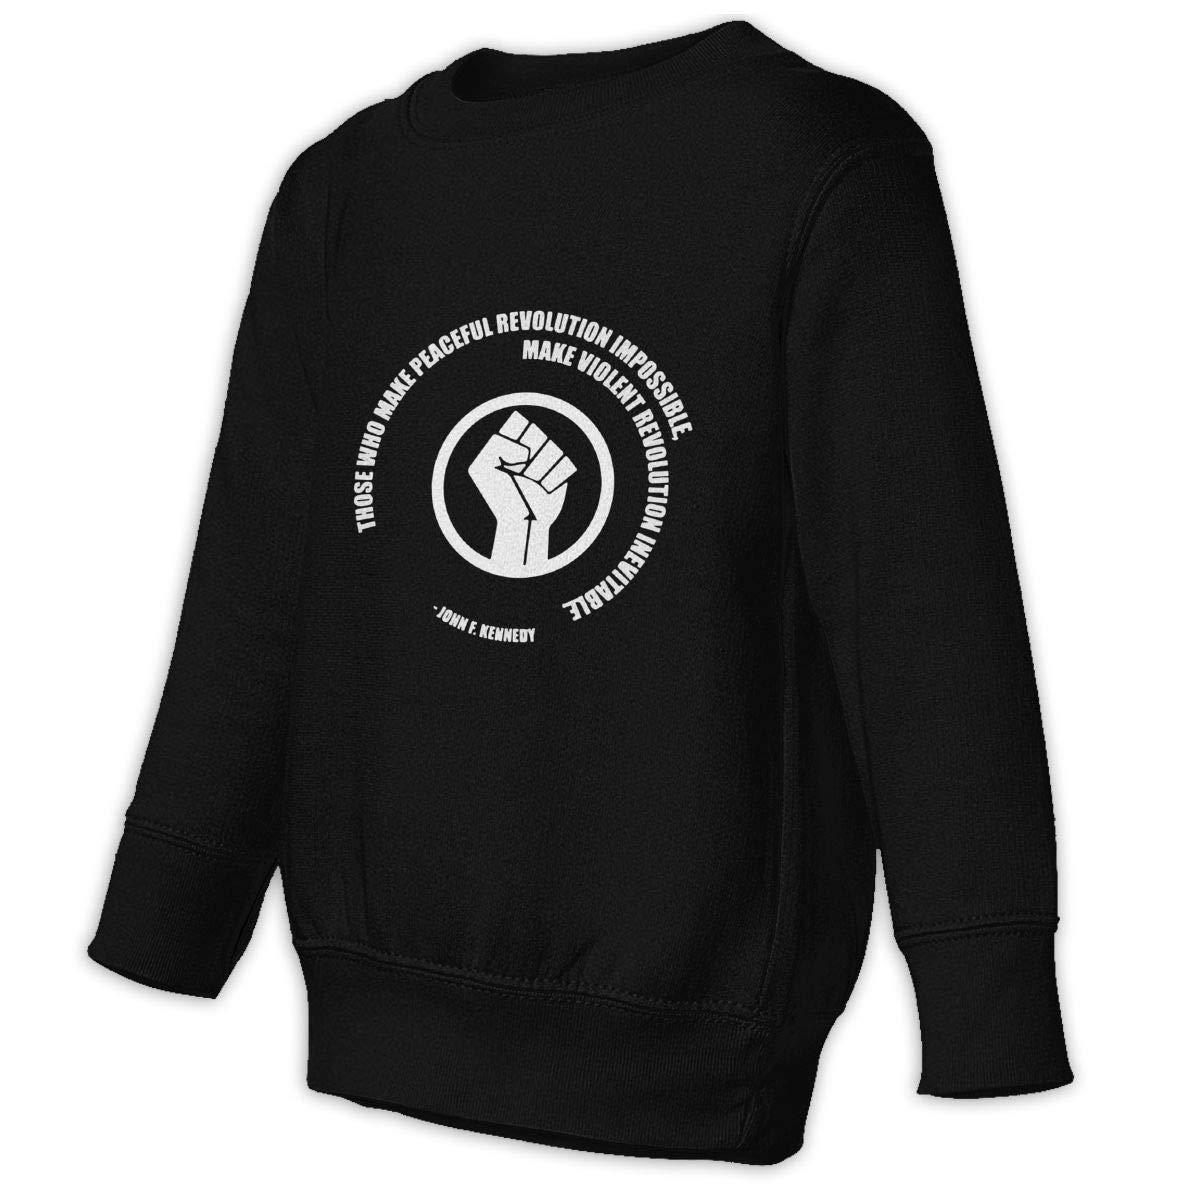 Childrens Peaceful Revolution Winter Tops Outwear Pullover Sweatshirt Black by WKNG8JK